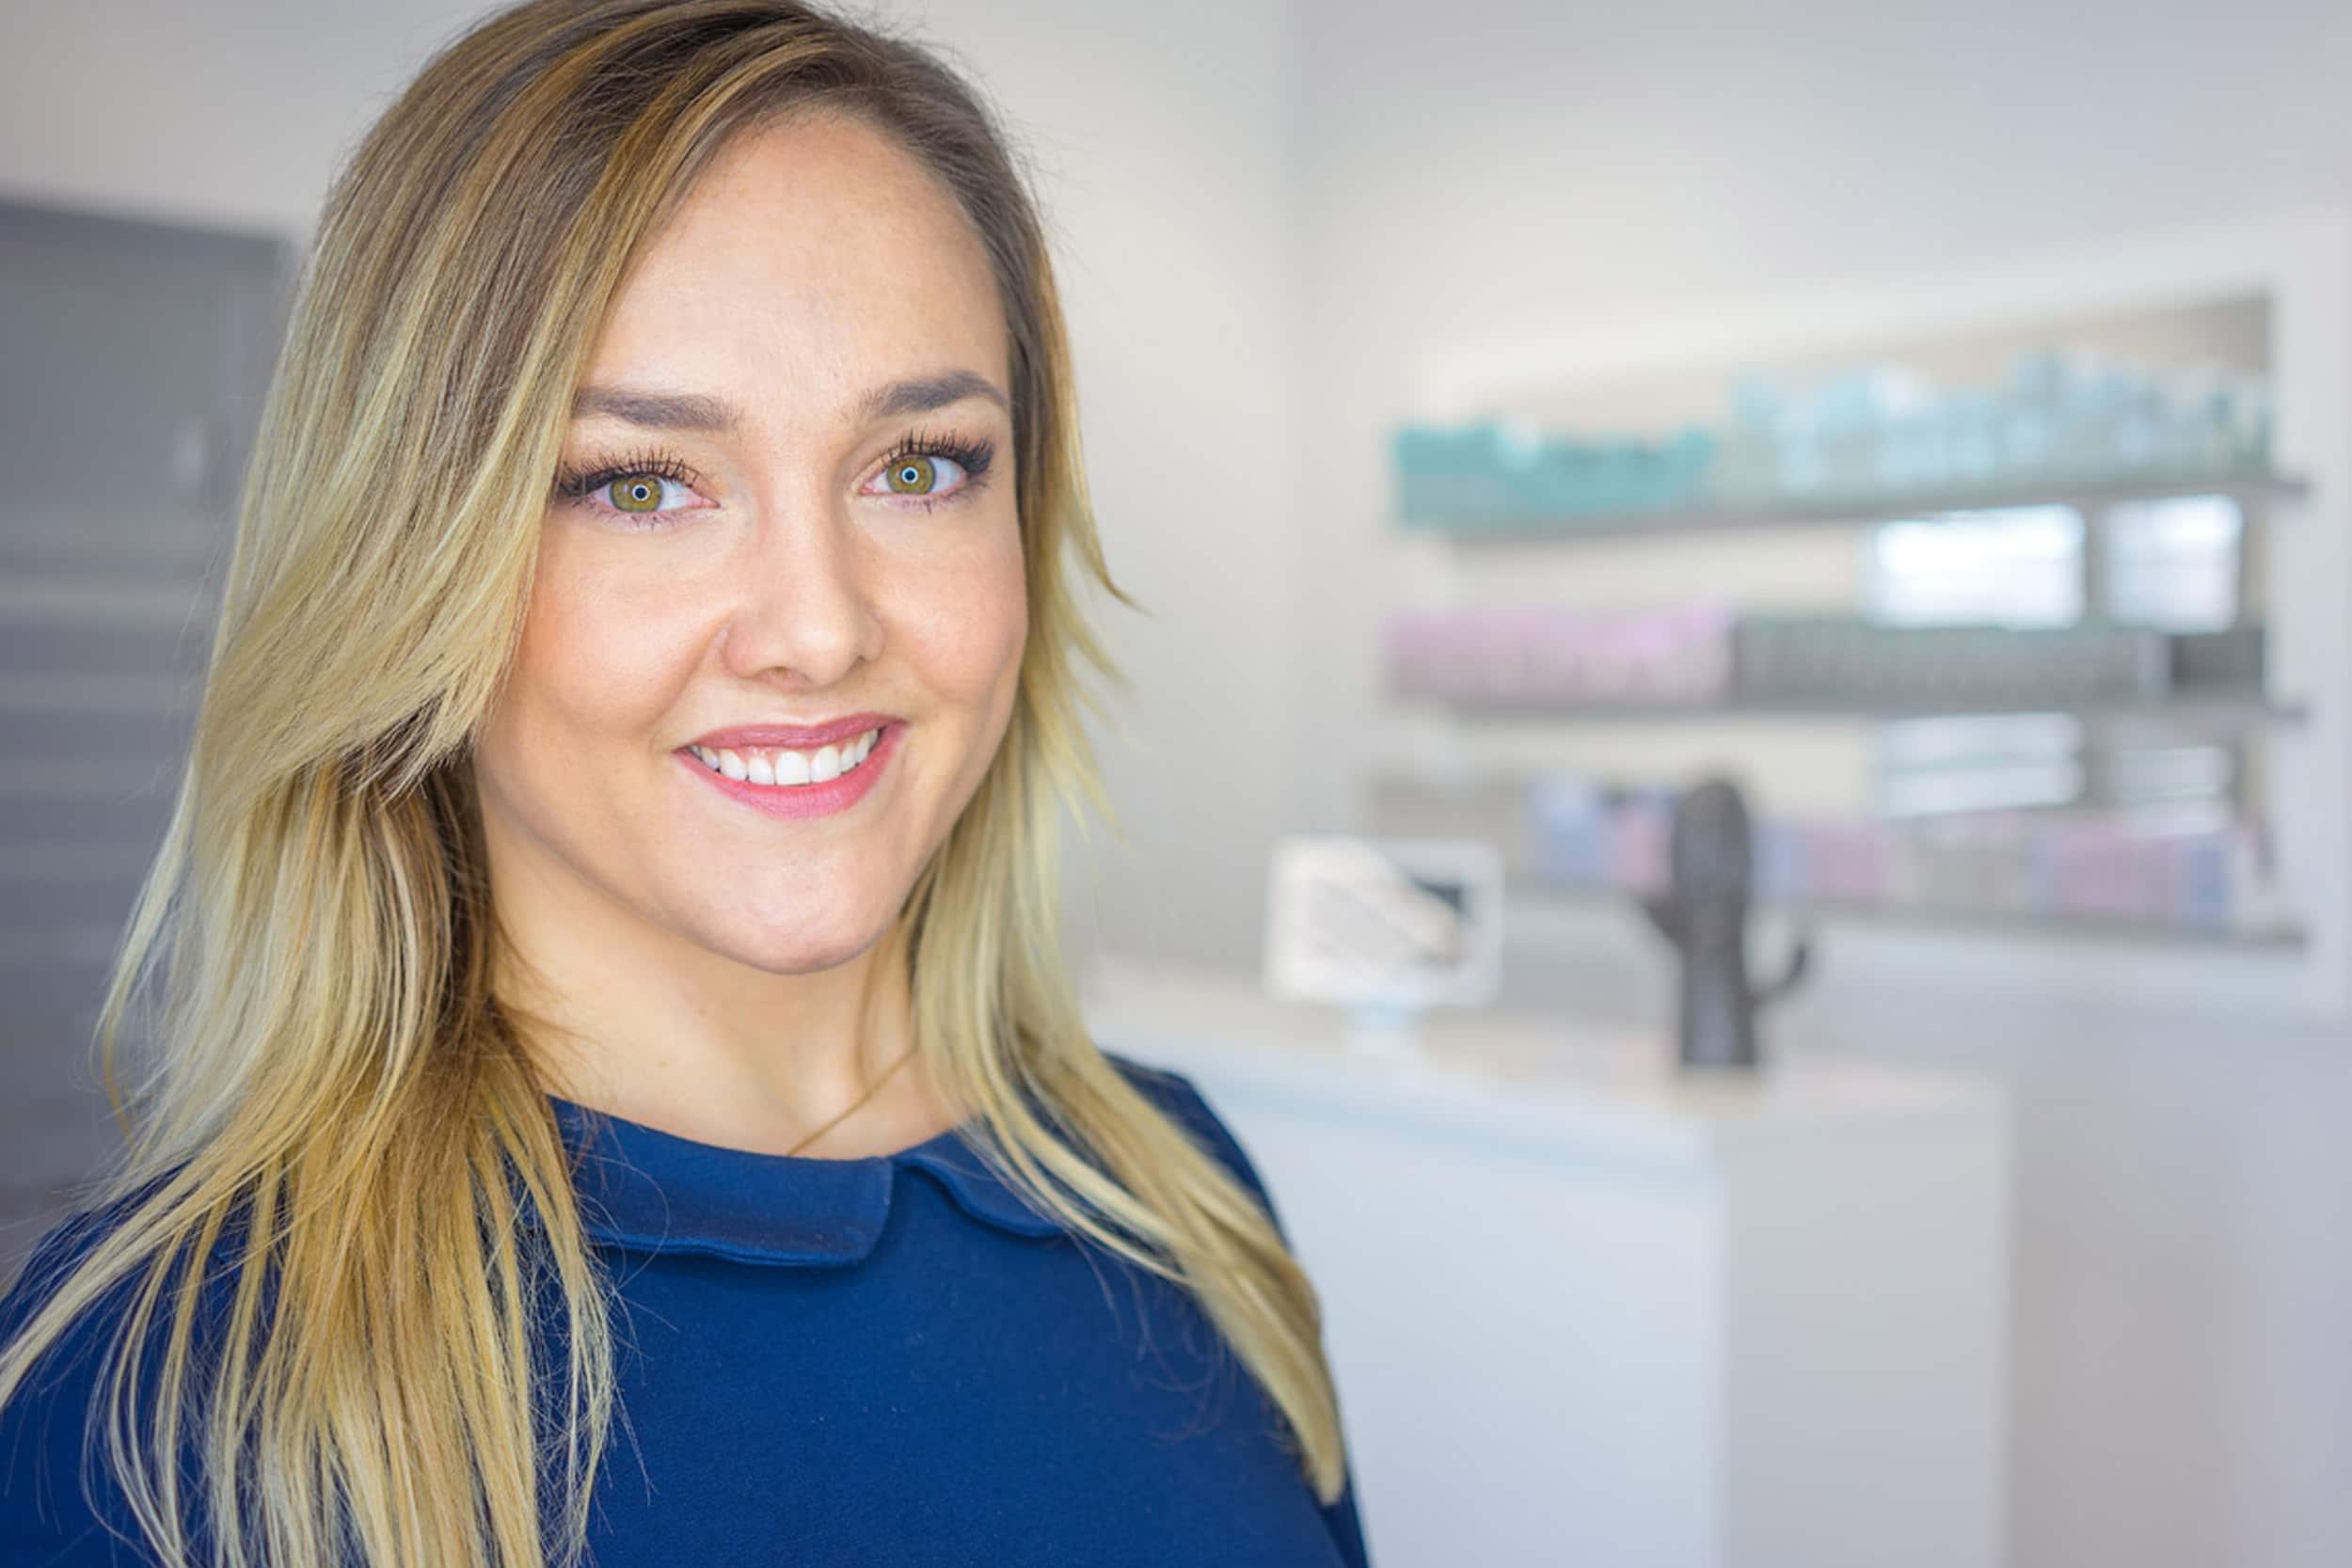 kosmetikstudio dortmund